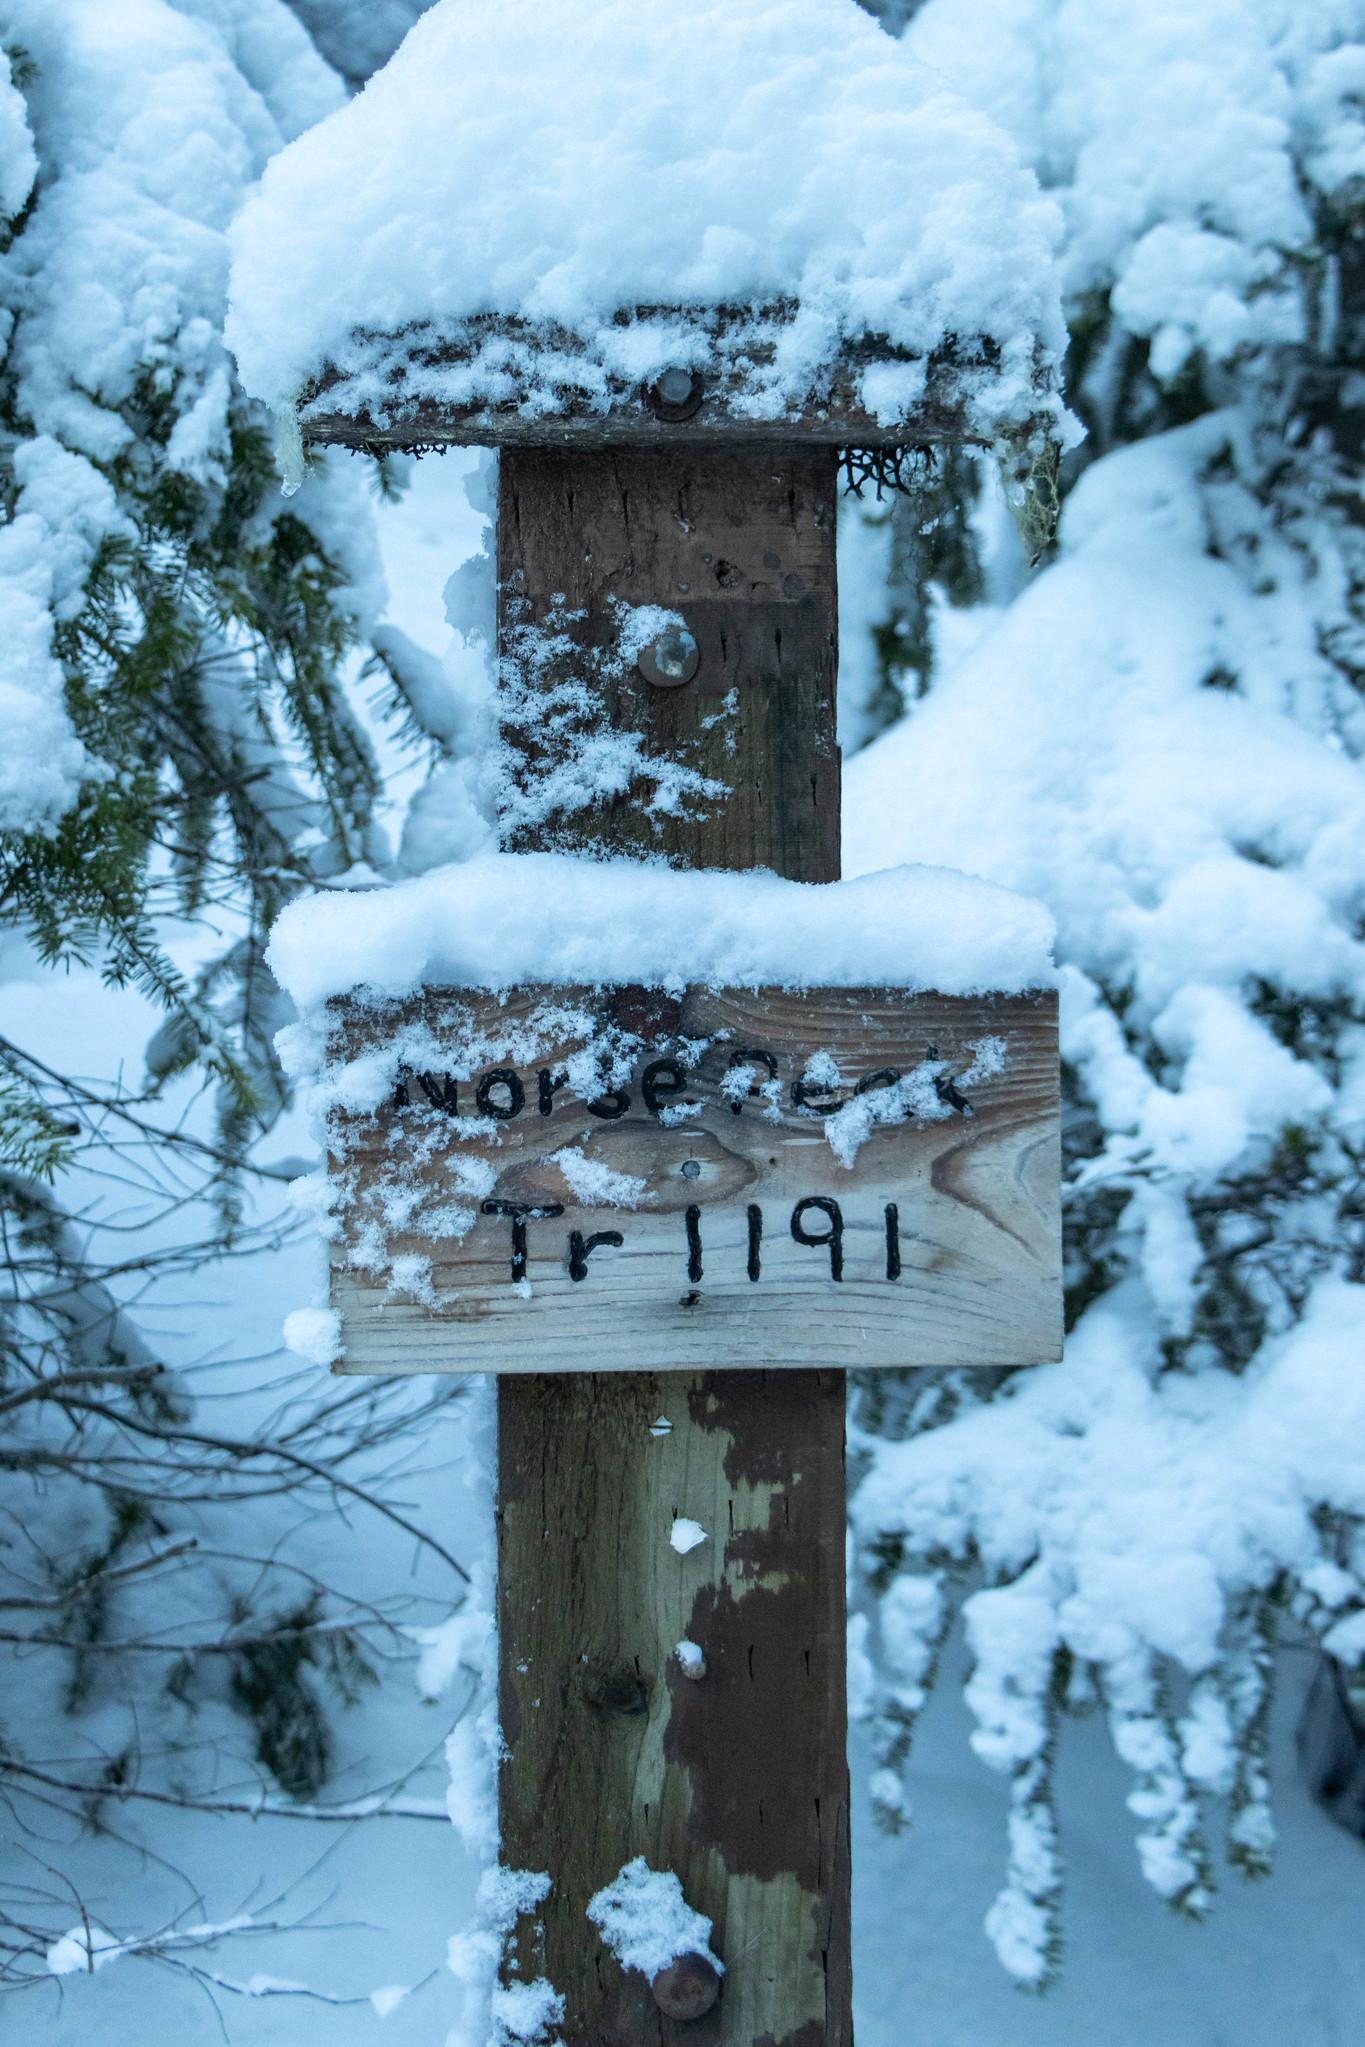 Norse Peak Trailhead